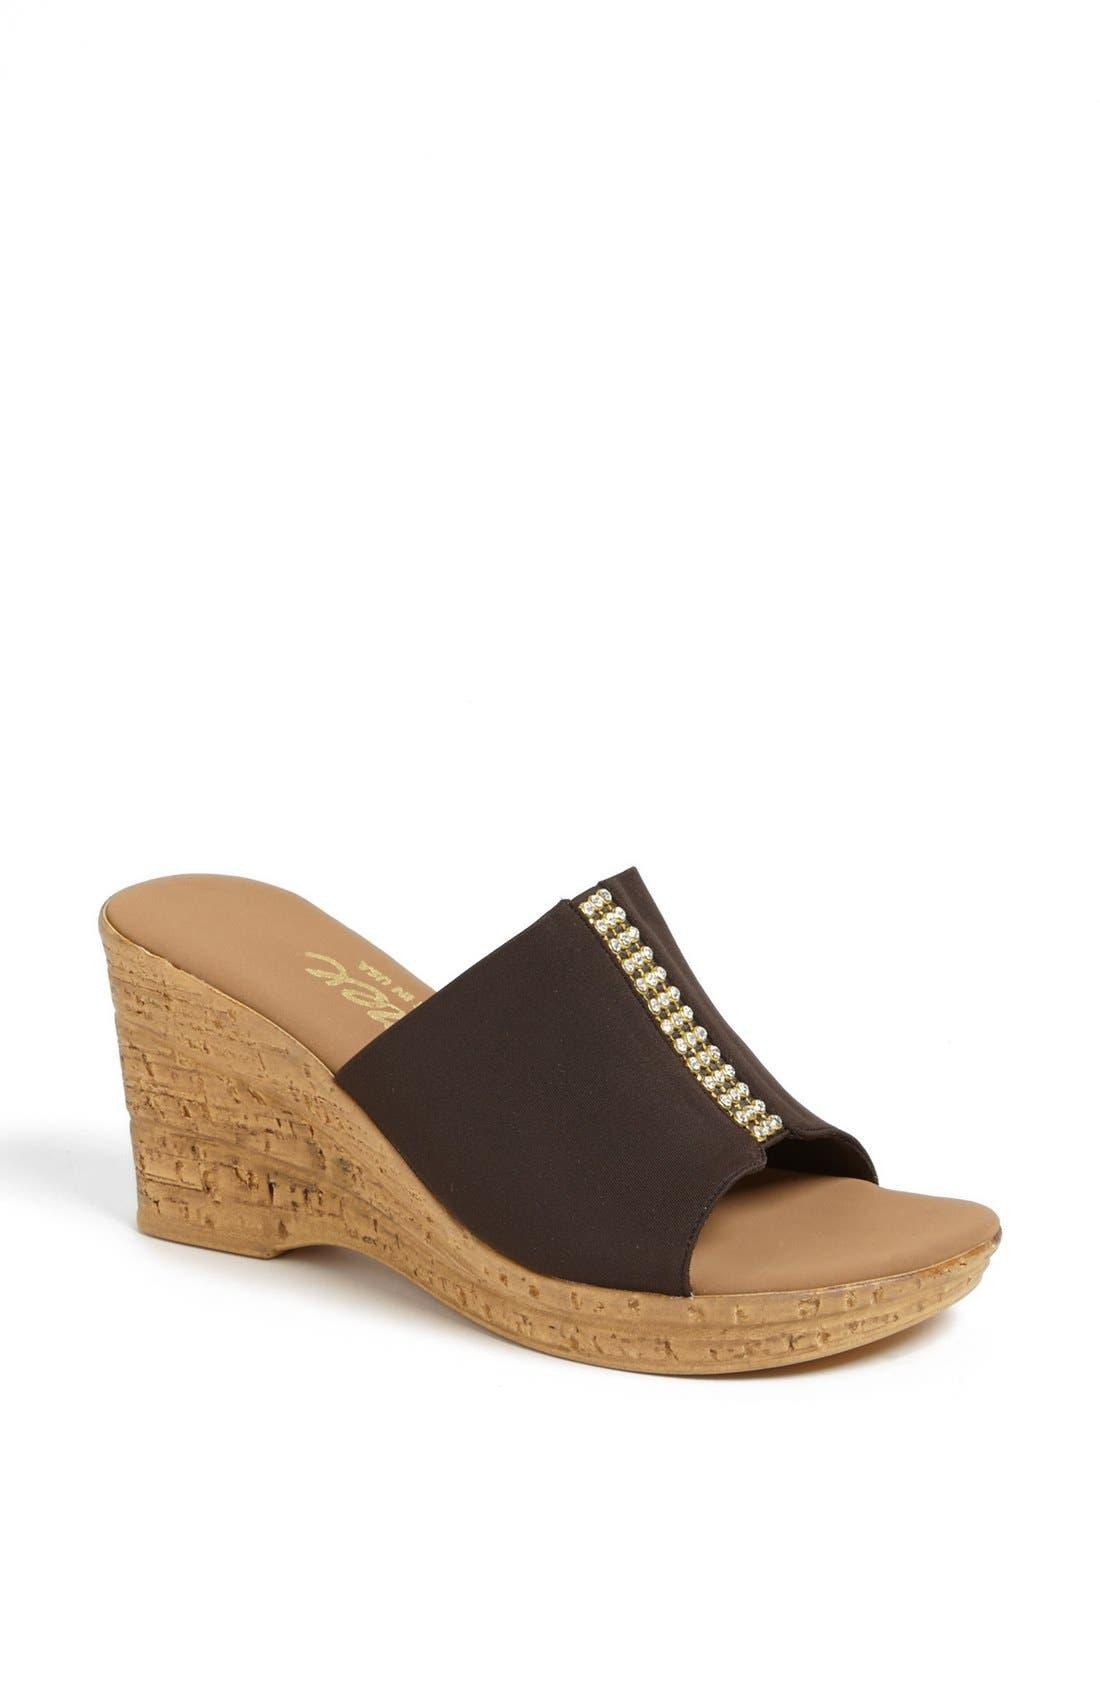 Main Image - Onex 'Billie' Wedge Sandal